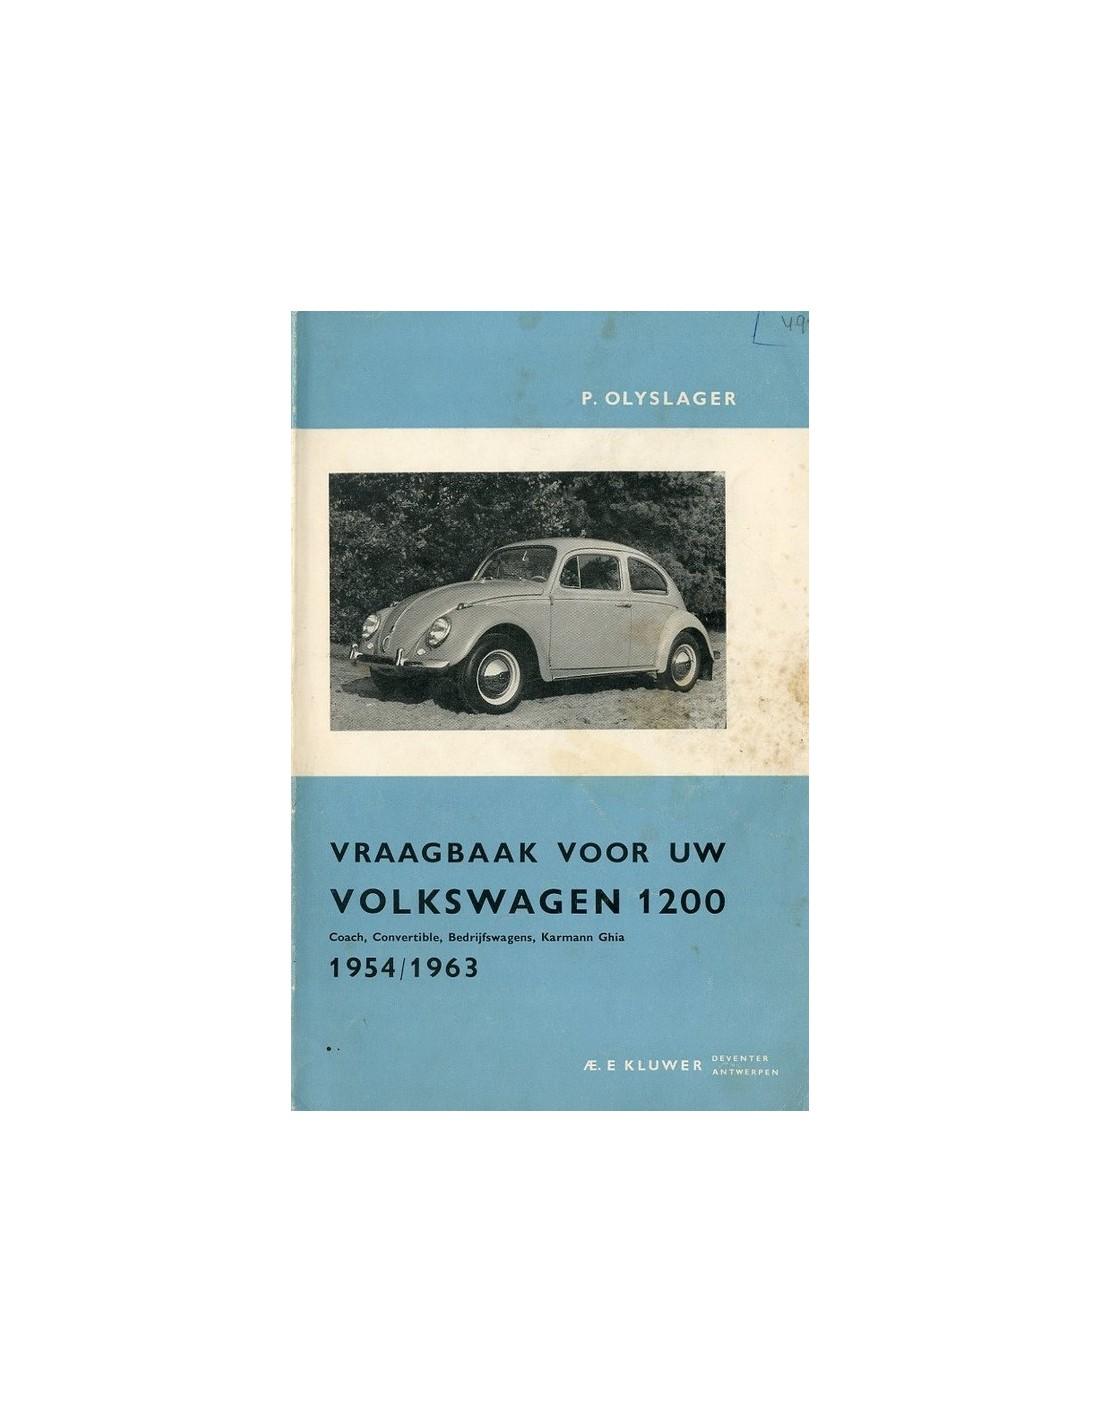 shop manual vw 1954 rh shop manual vw 1954 tempower us